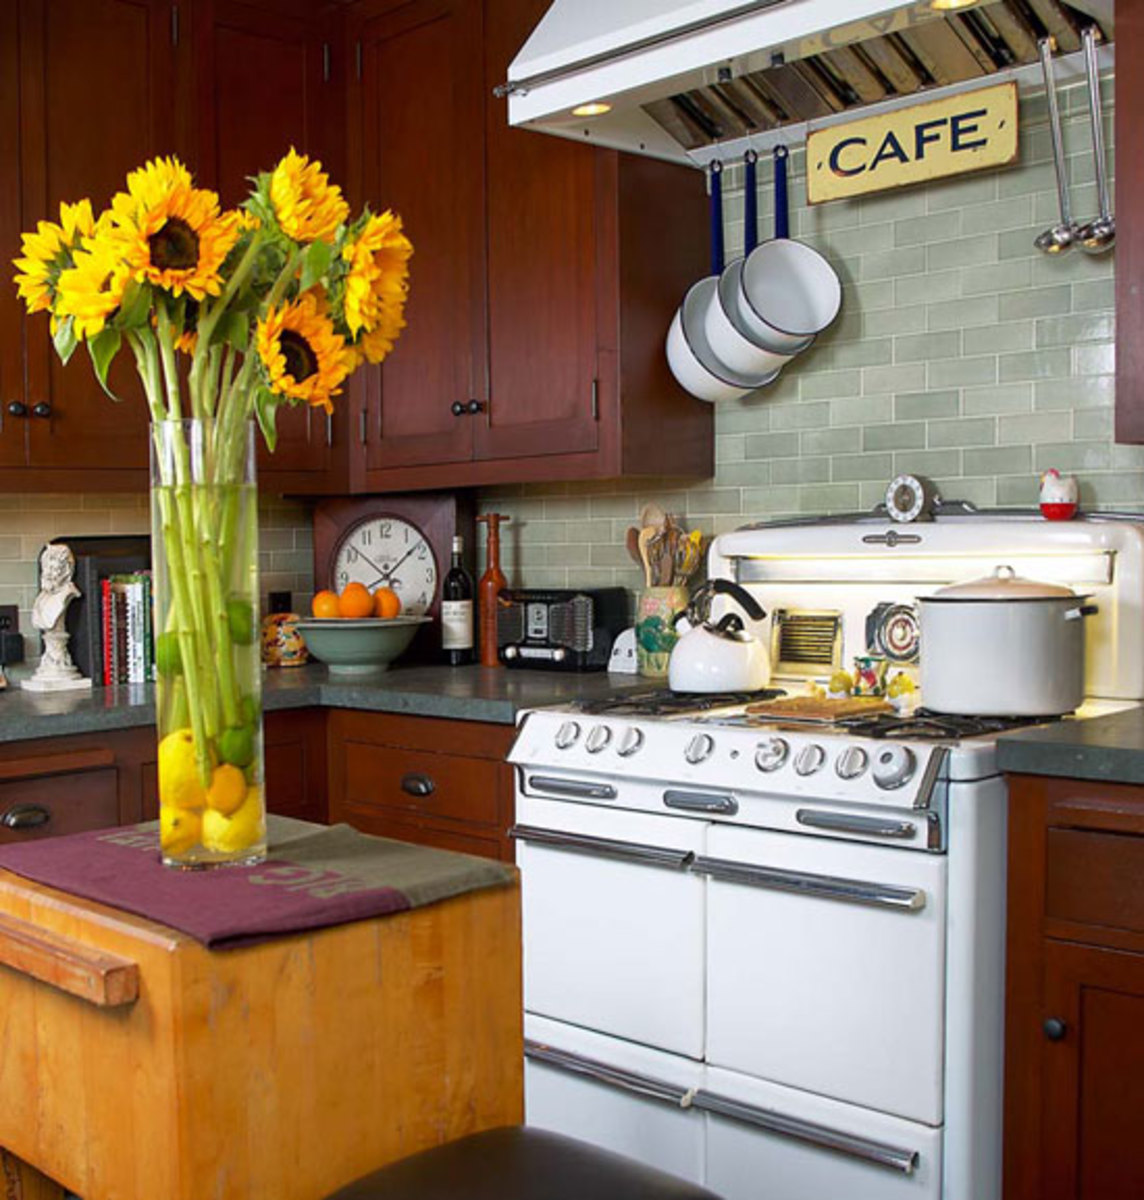 Kitchen Sinks & Countertops: Go Trendy Or Timeless?